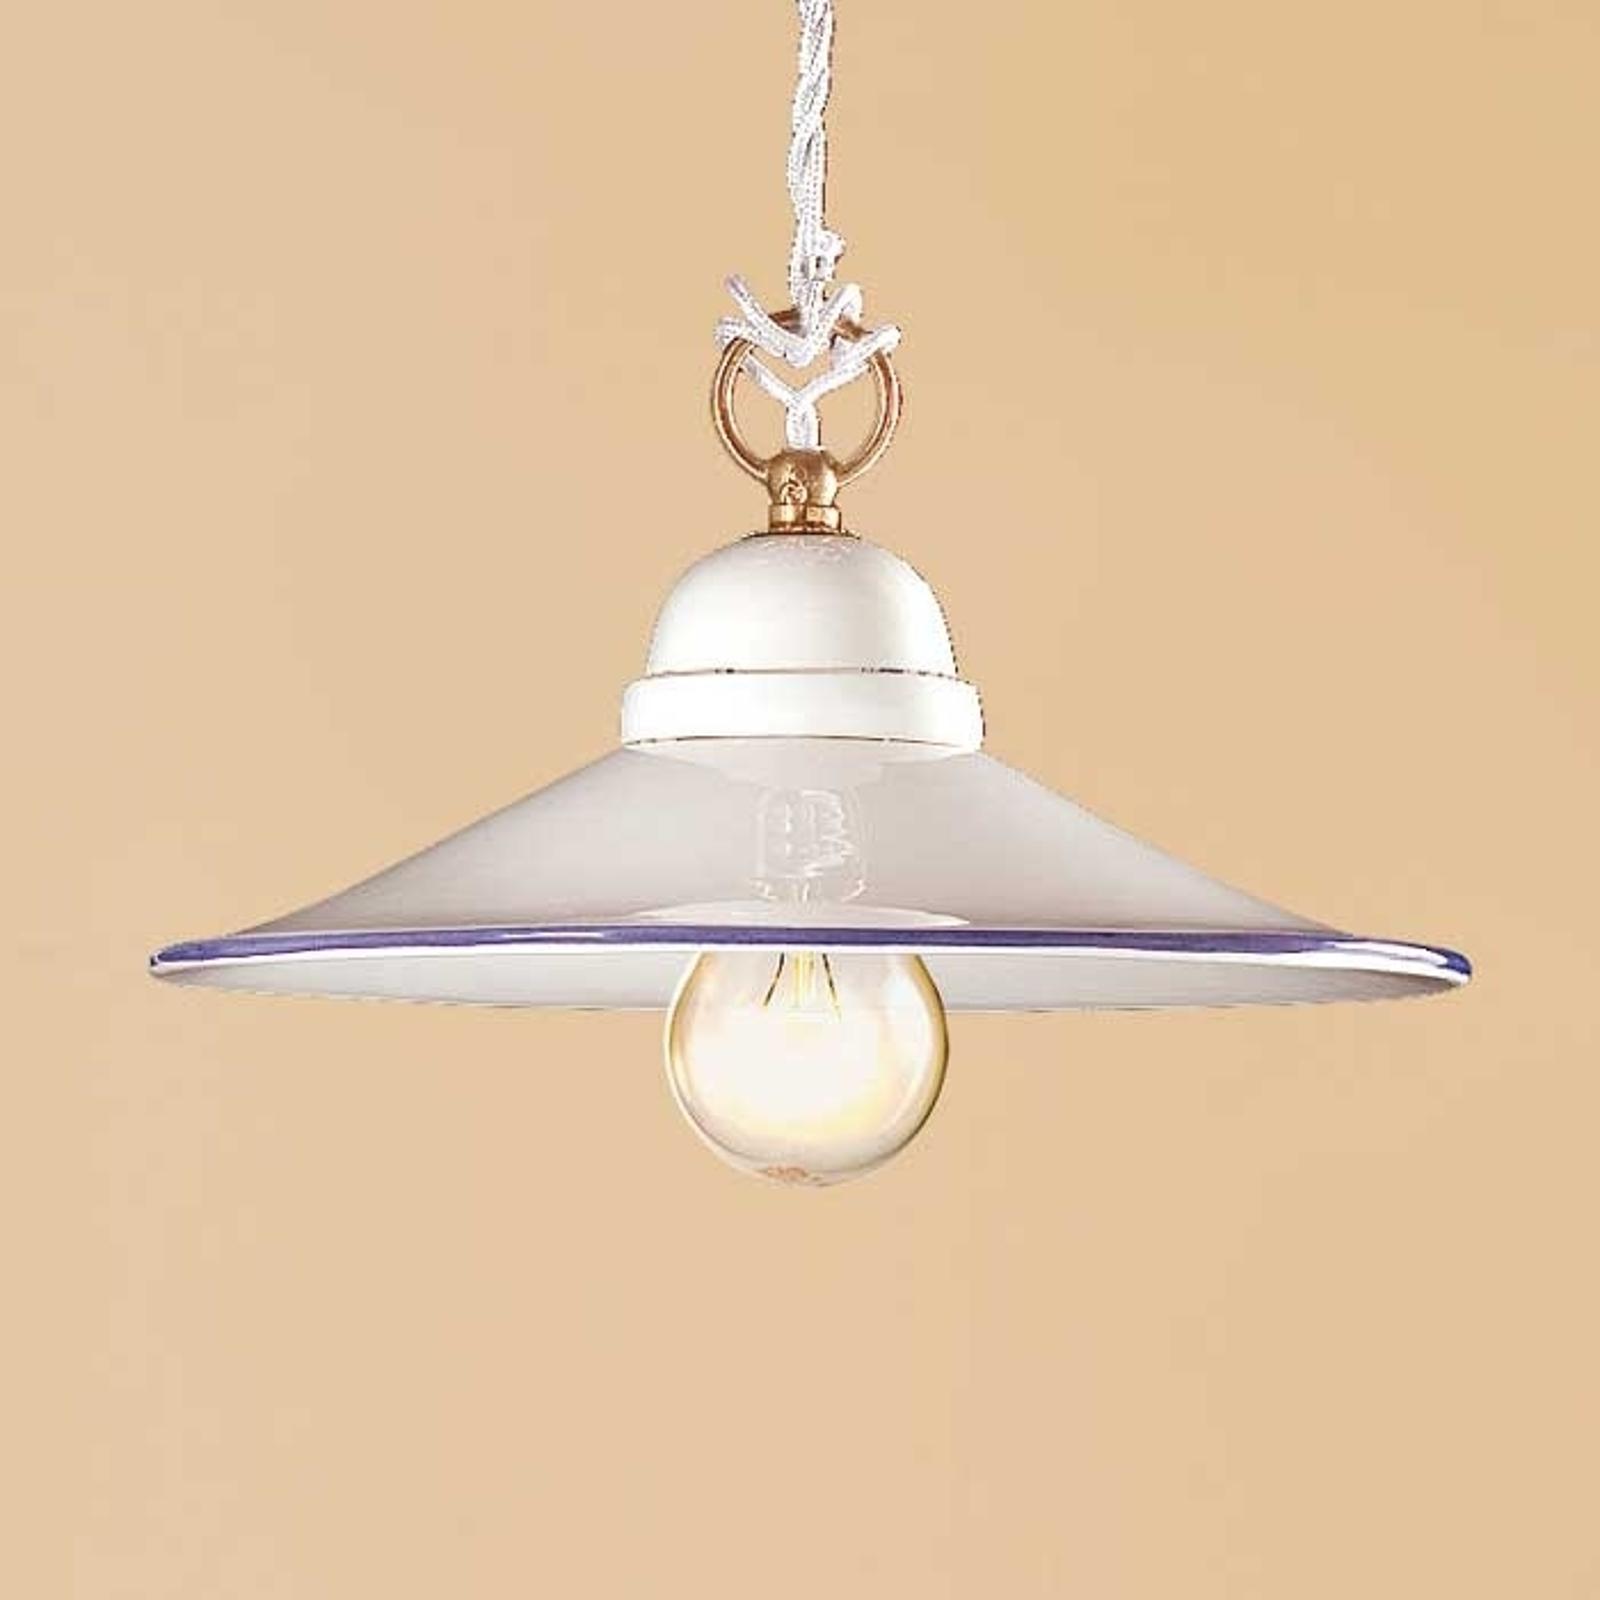 Mooie hanglamp PIATTO van keramiek, 28 cm